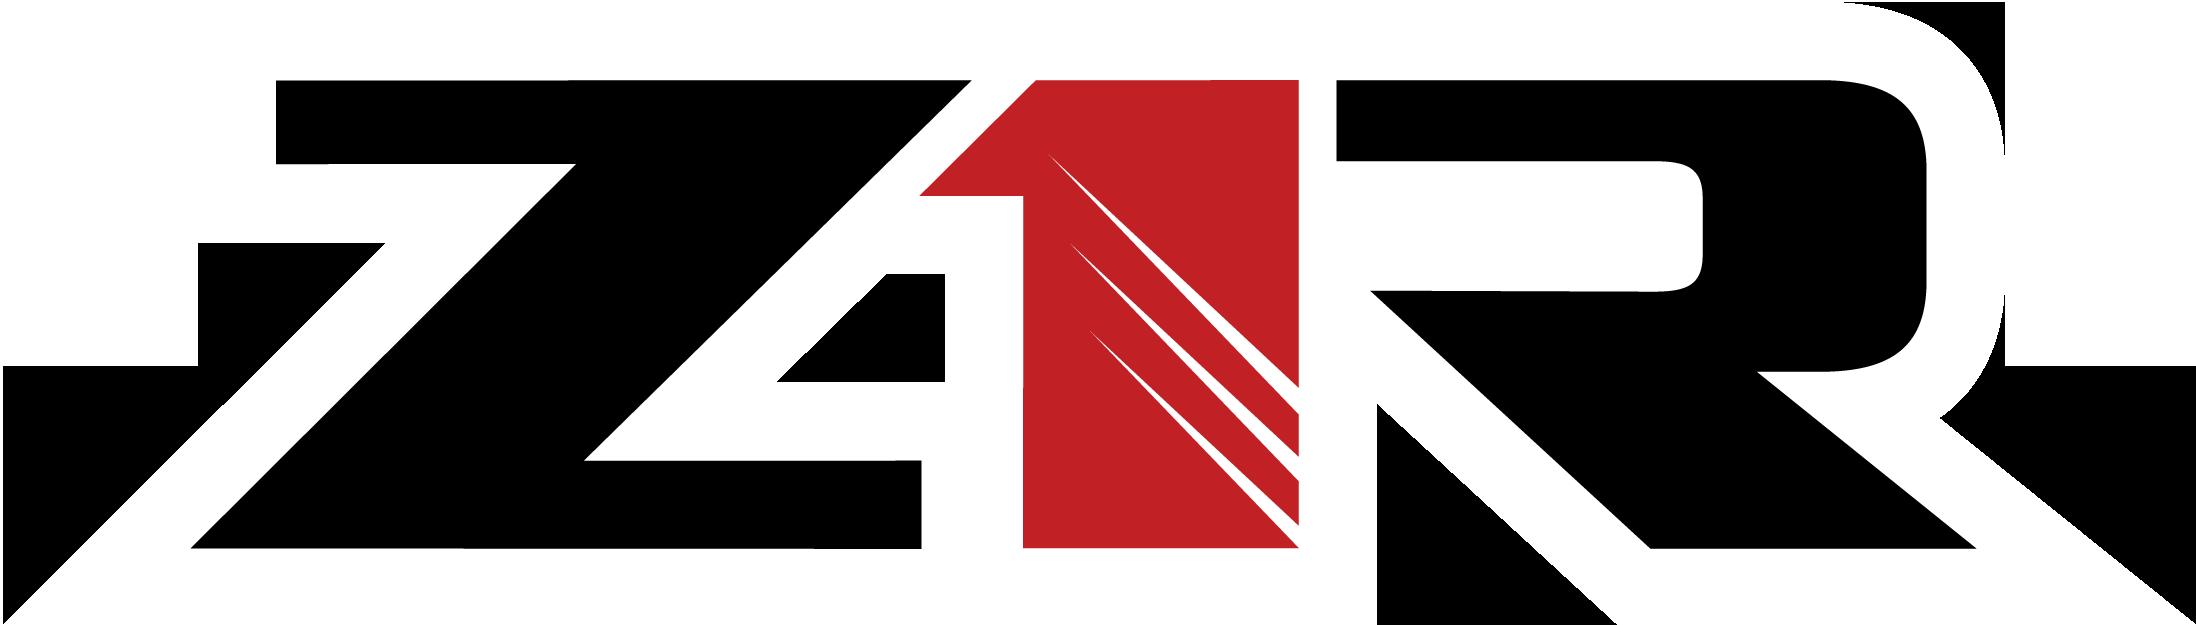 Z1RblkLogo.png